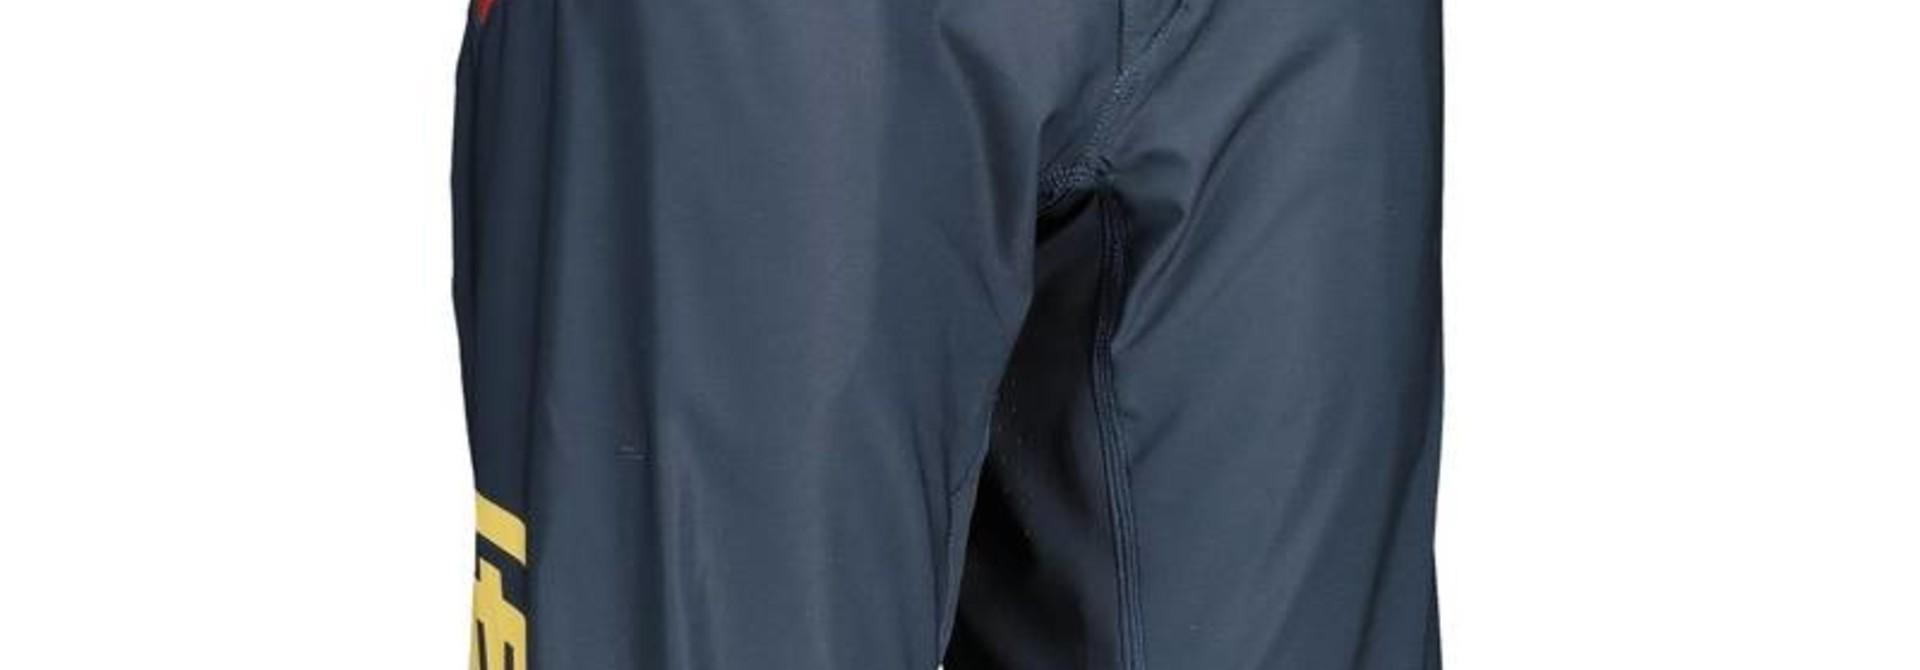 LEATT MTB 2.0 Womens Shorts -  Onyx